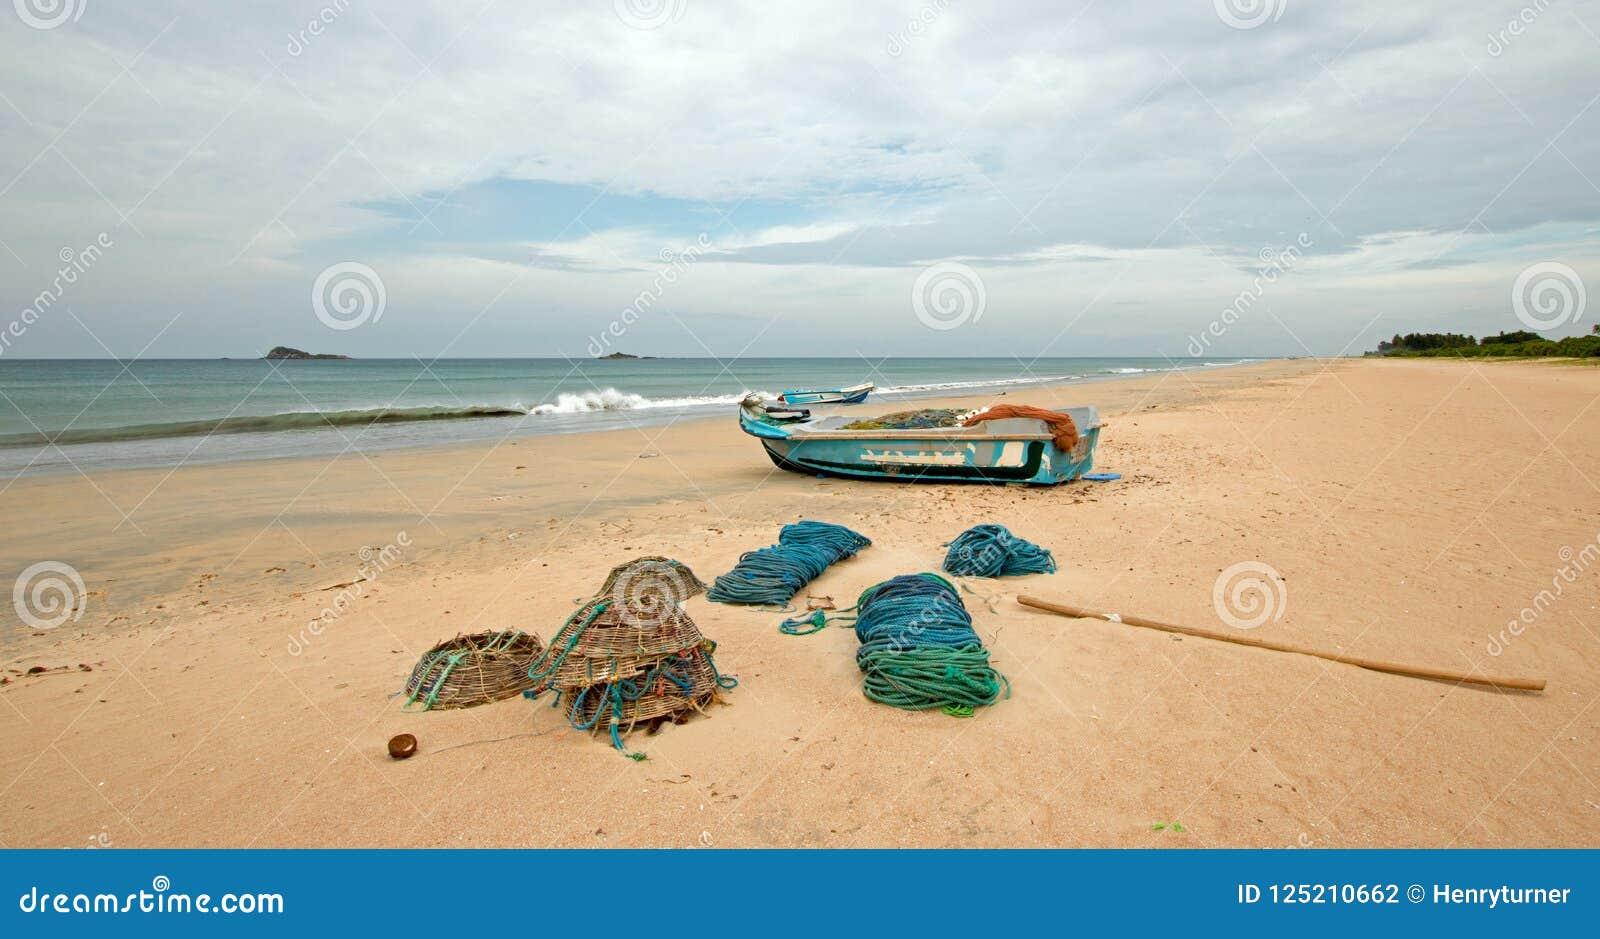 Netten, vallen, manden, en kabels naast vissersboot op Nilaveli-strand in Trincomalee Sri Lanka